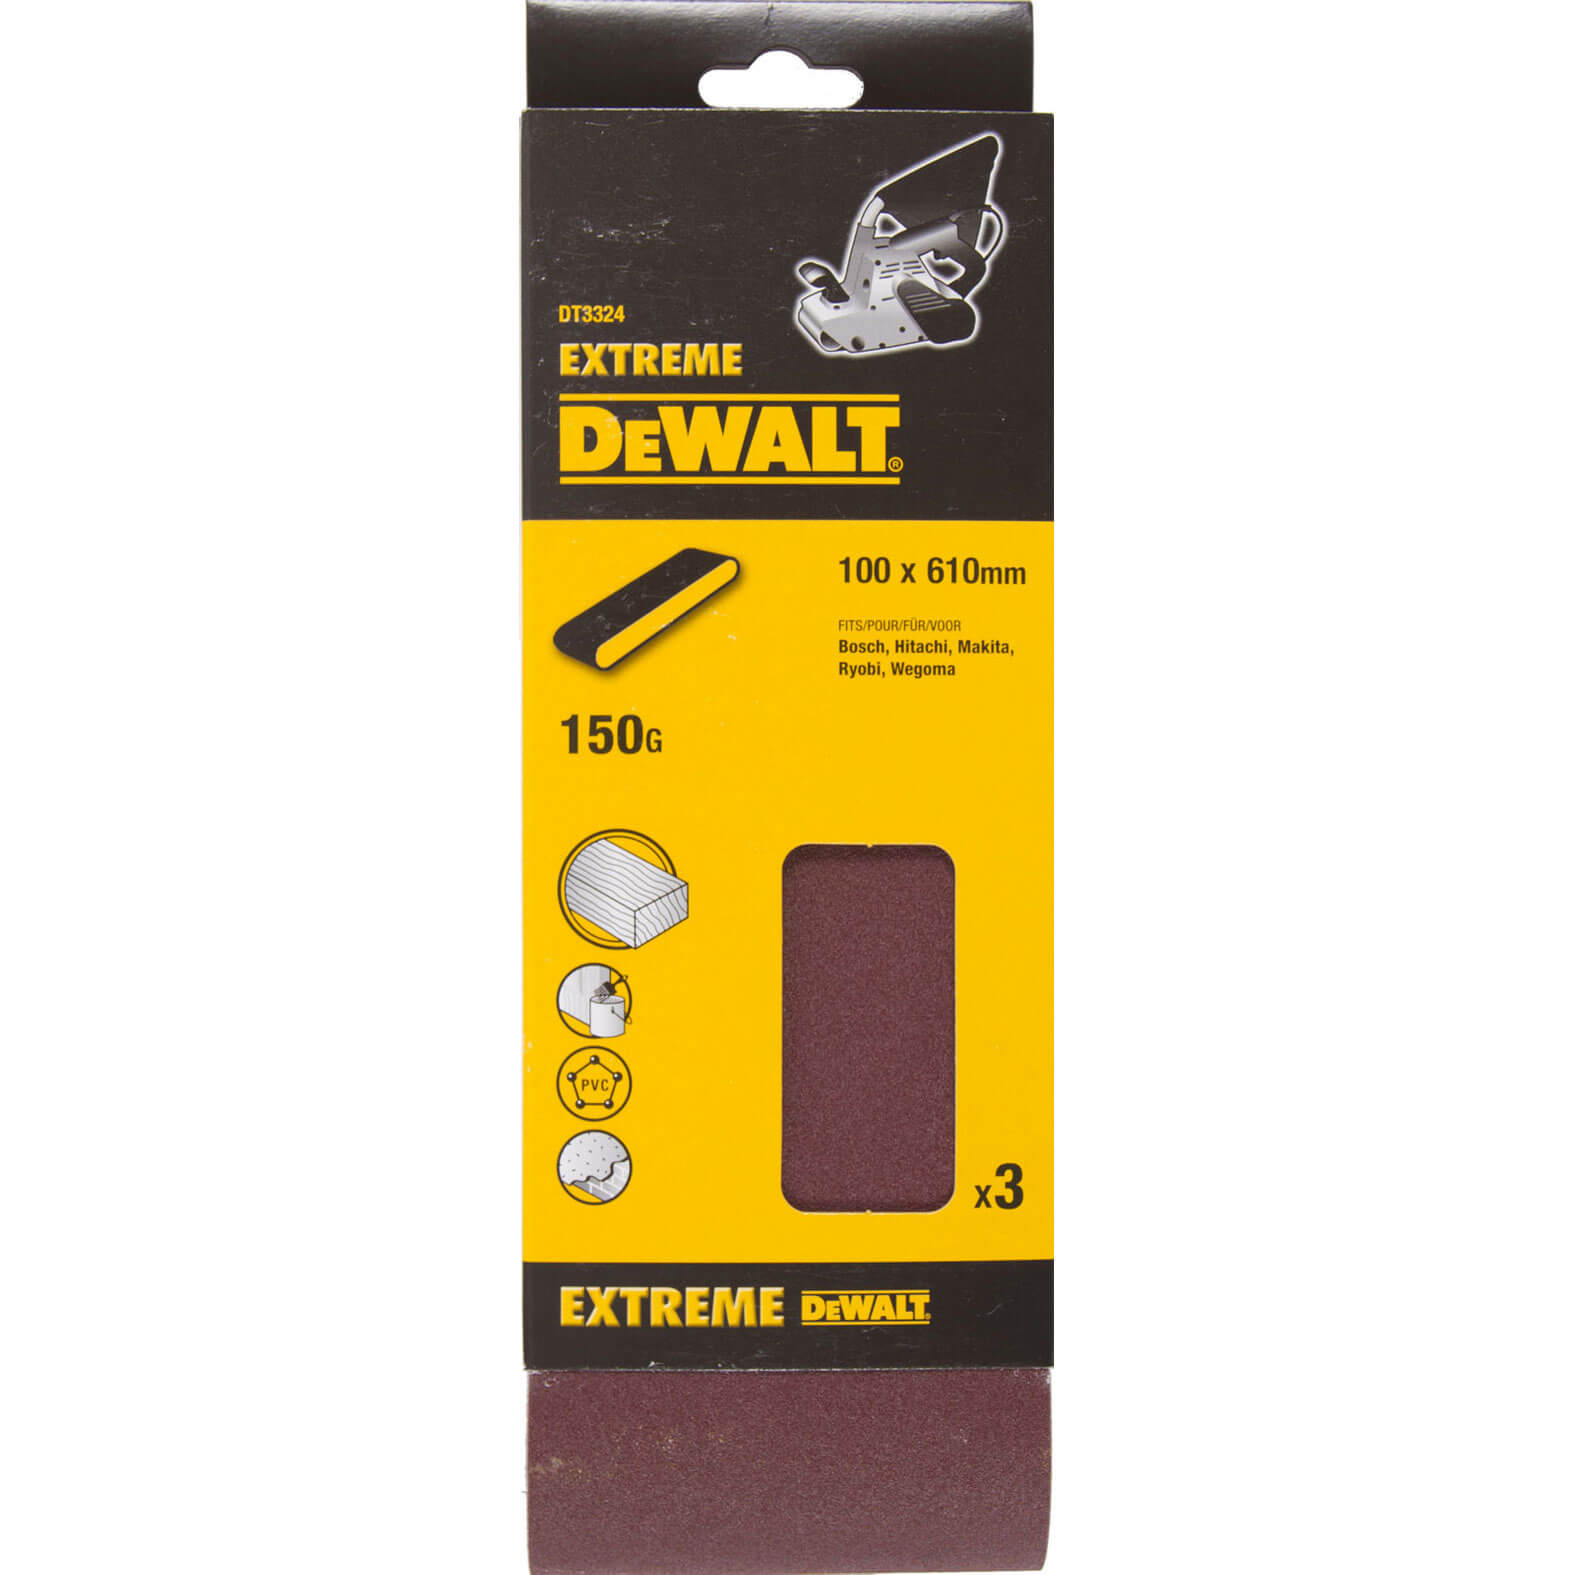 Image of DeWalt 100 x 610mm Multi Purpose Sanding Belts 100mm x 610mm 150g Pack of 3